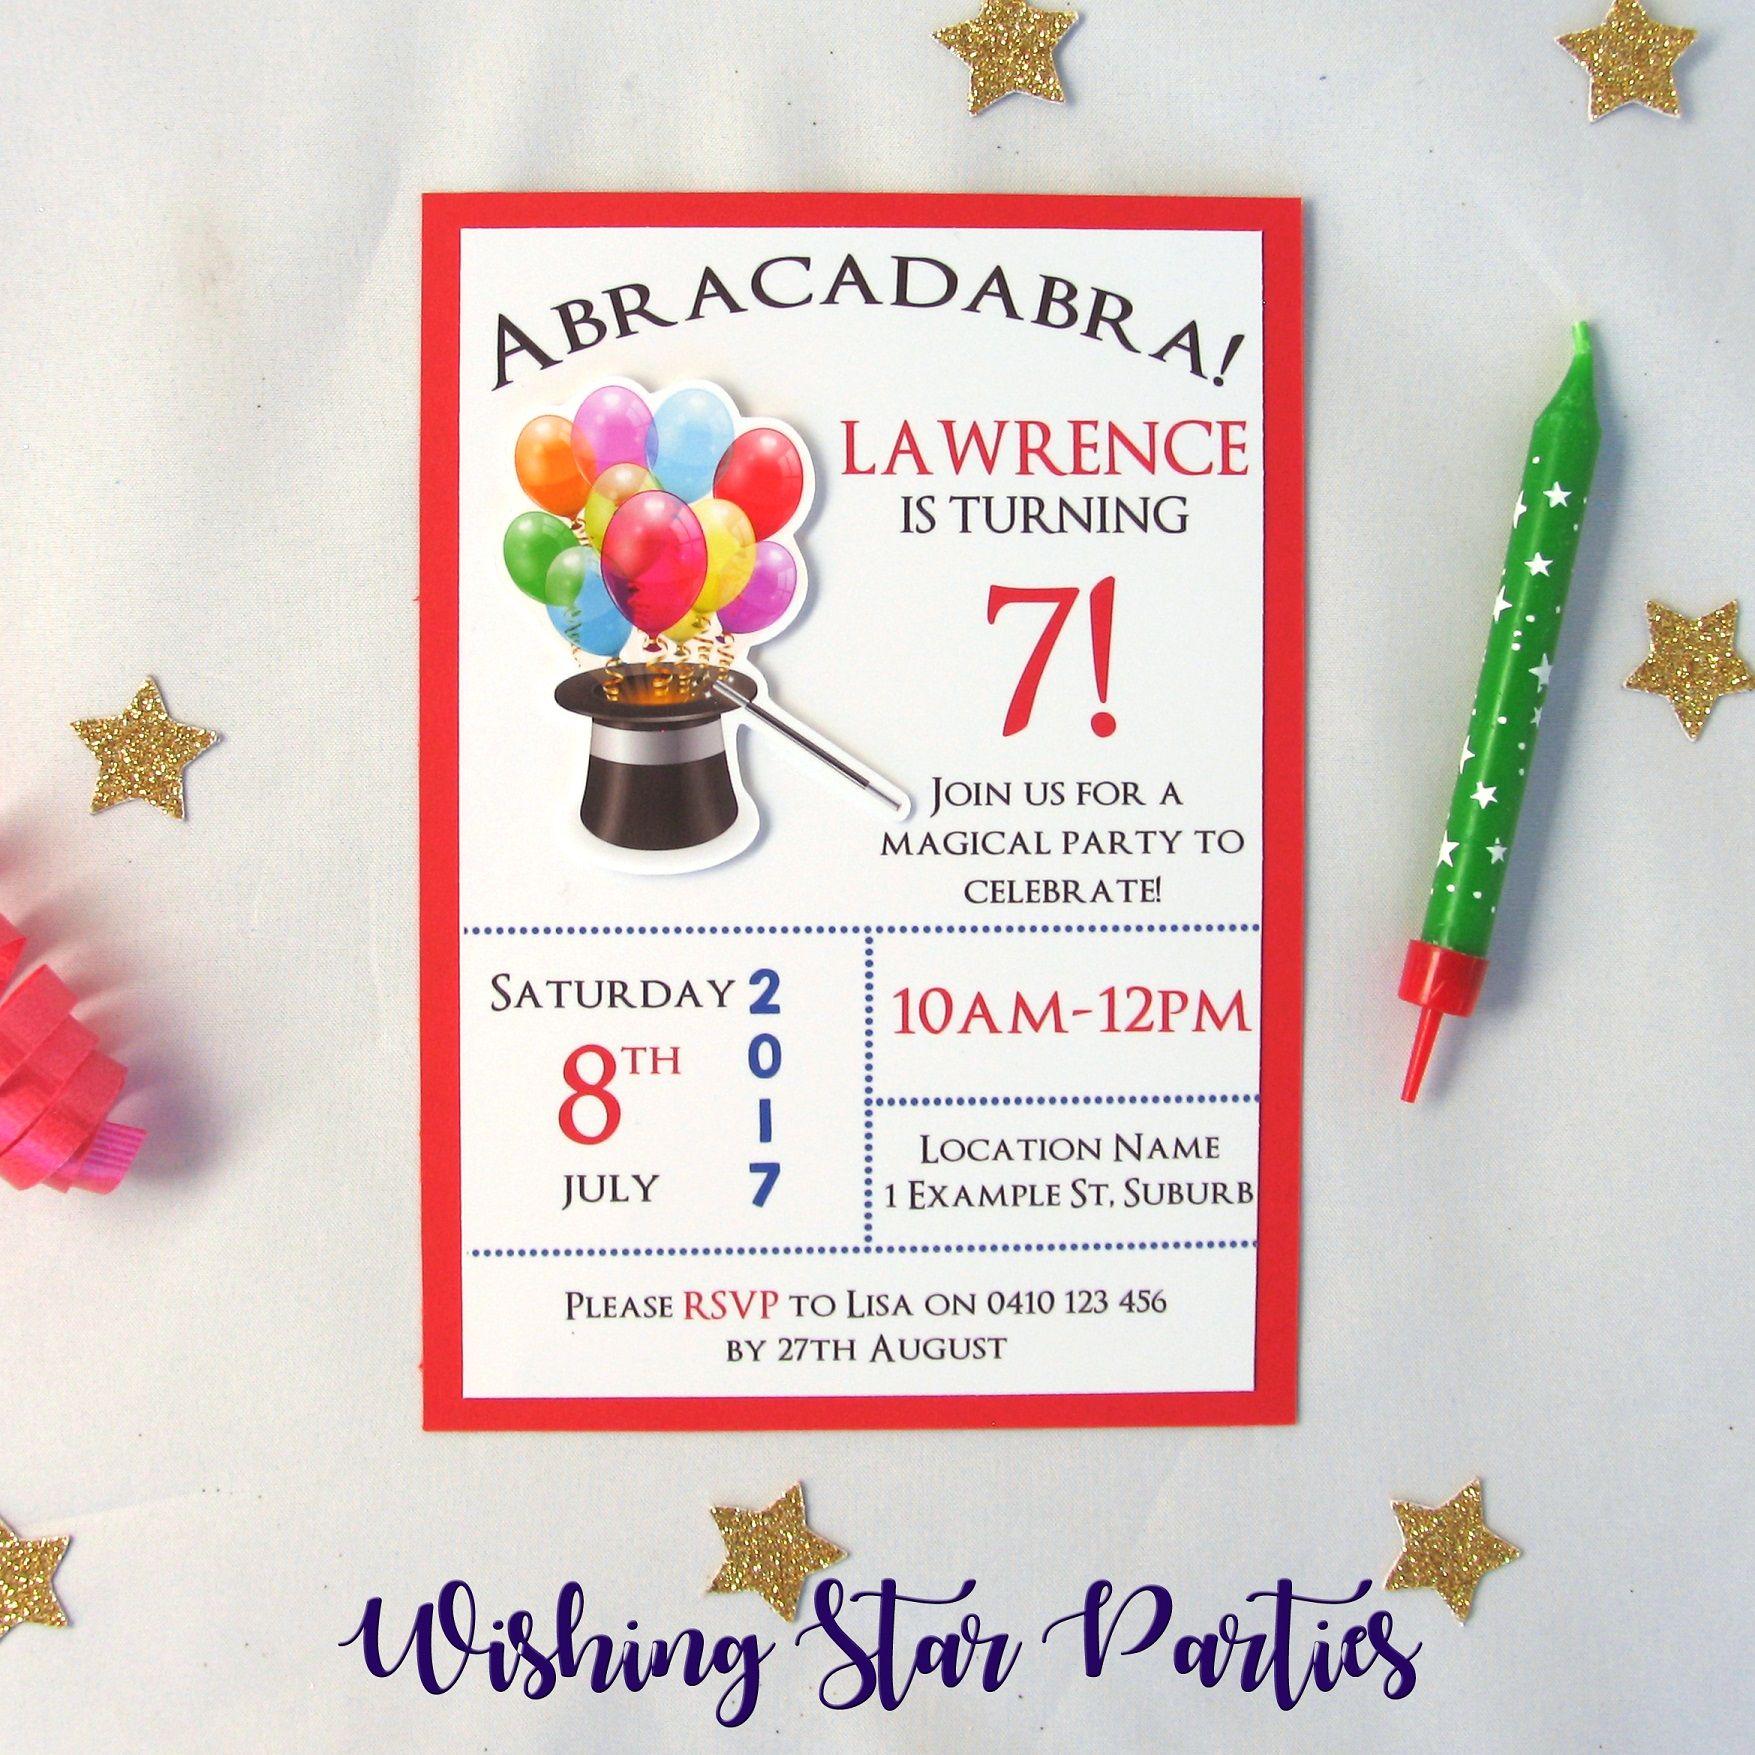 3D Magic Themed Birthday Party Invitations | Themed birthday parties ...